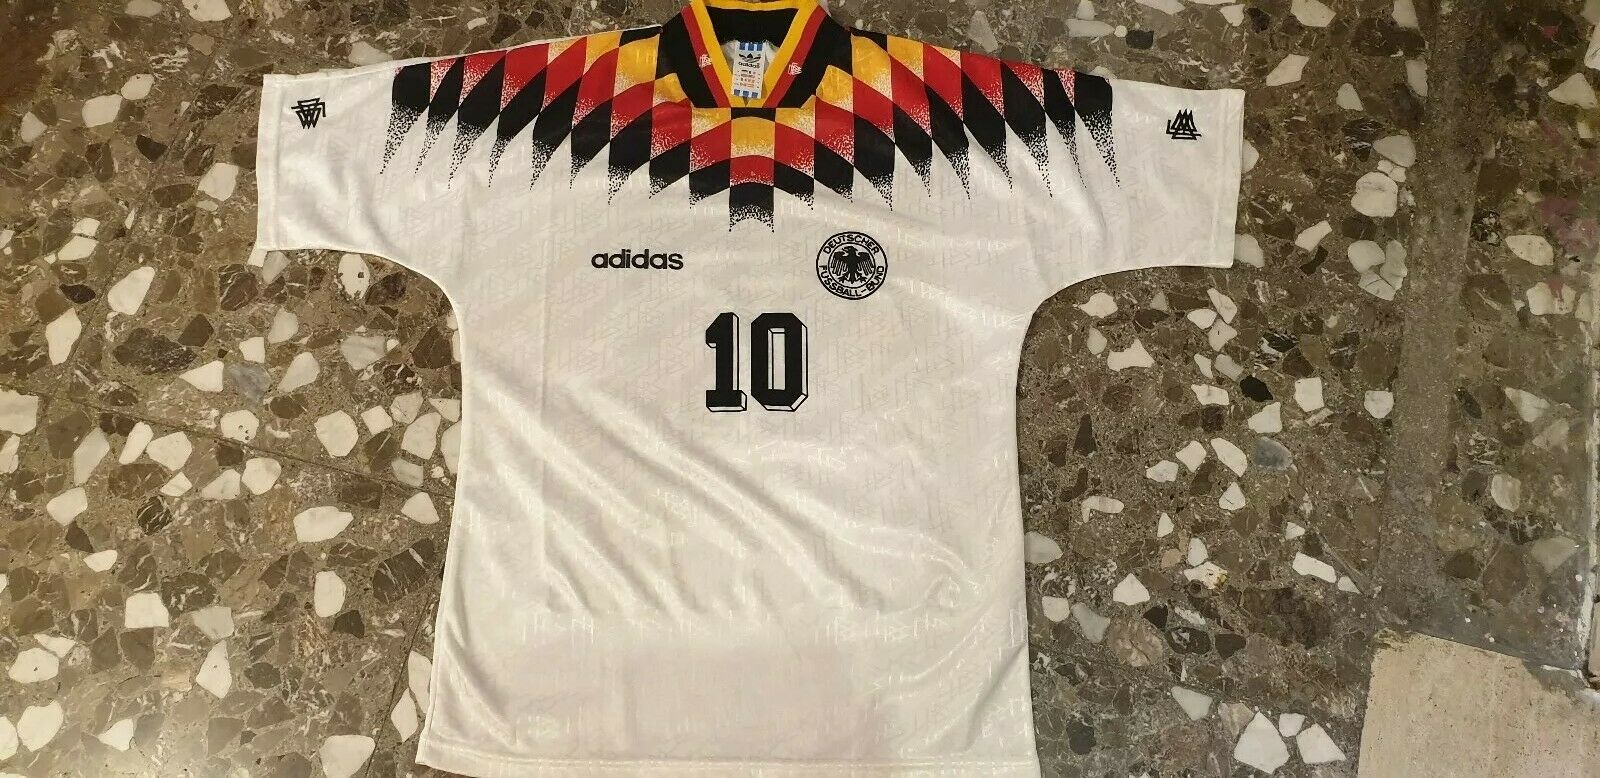 Maglia shirt Geruomoia Deutschle Adidas 1994  10 Matthaus